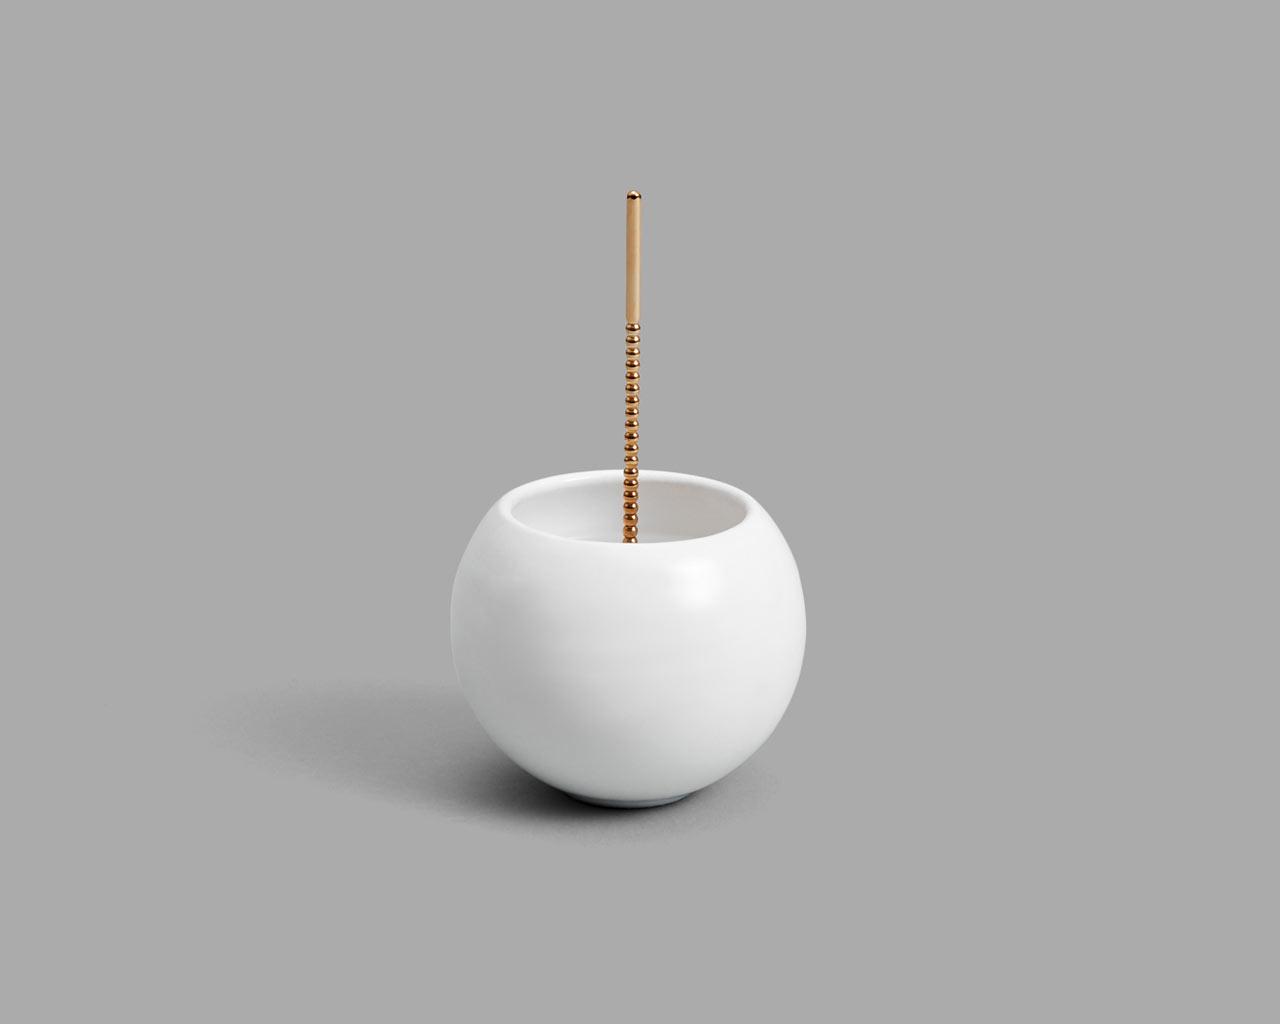 bubble-wand-othr-2